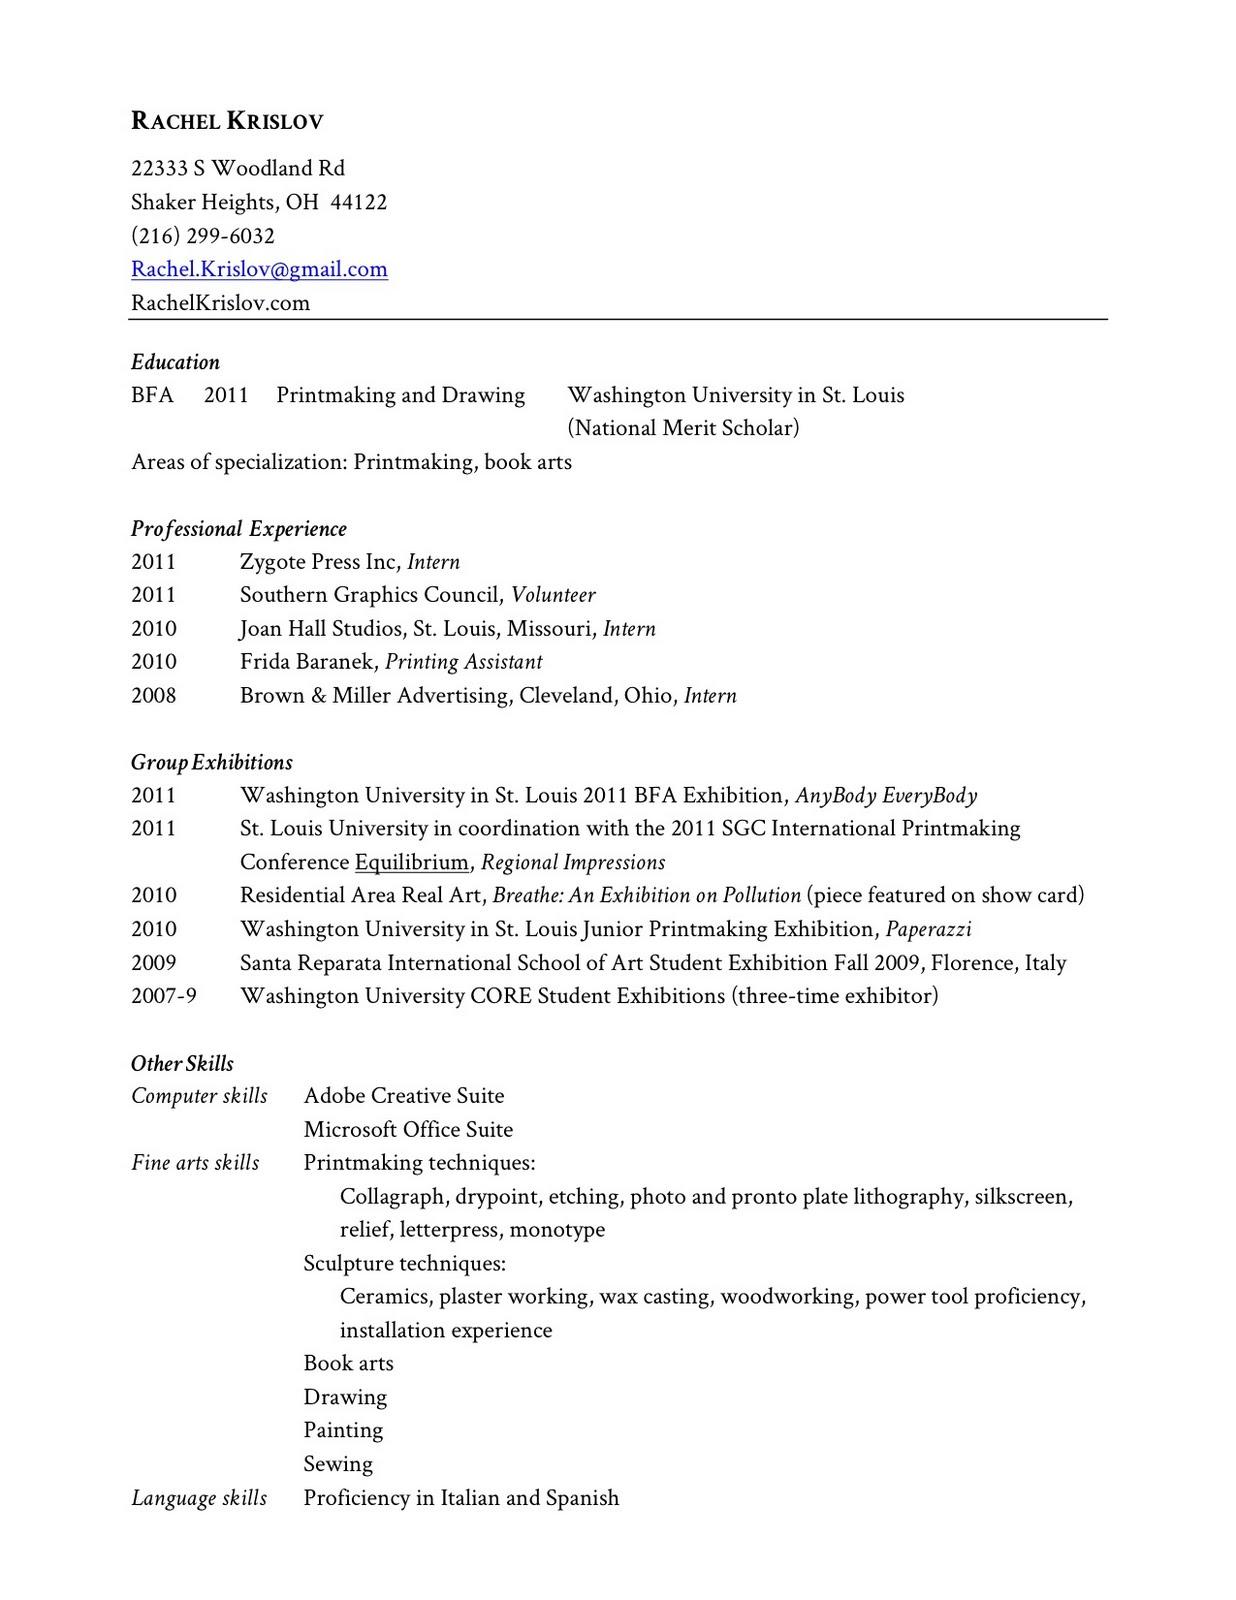 Makeup Artist Curriculum Vitae | Sample Customer Service Resume on art paintings, art thank you letters, art best resume, art writing, art recommendation letter, art address, art profile,